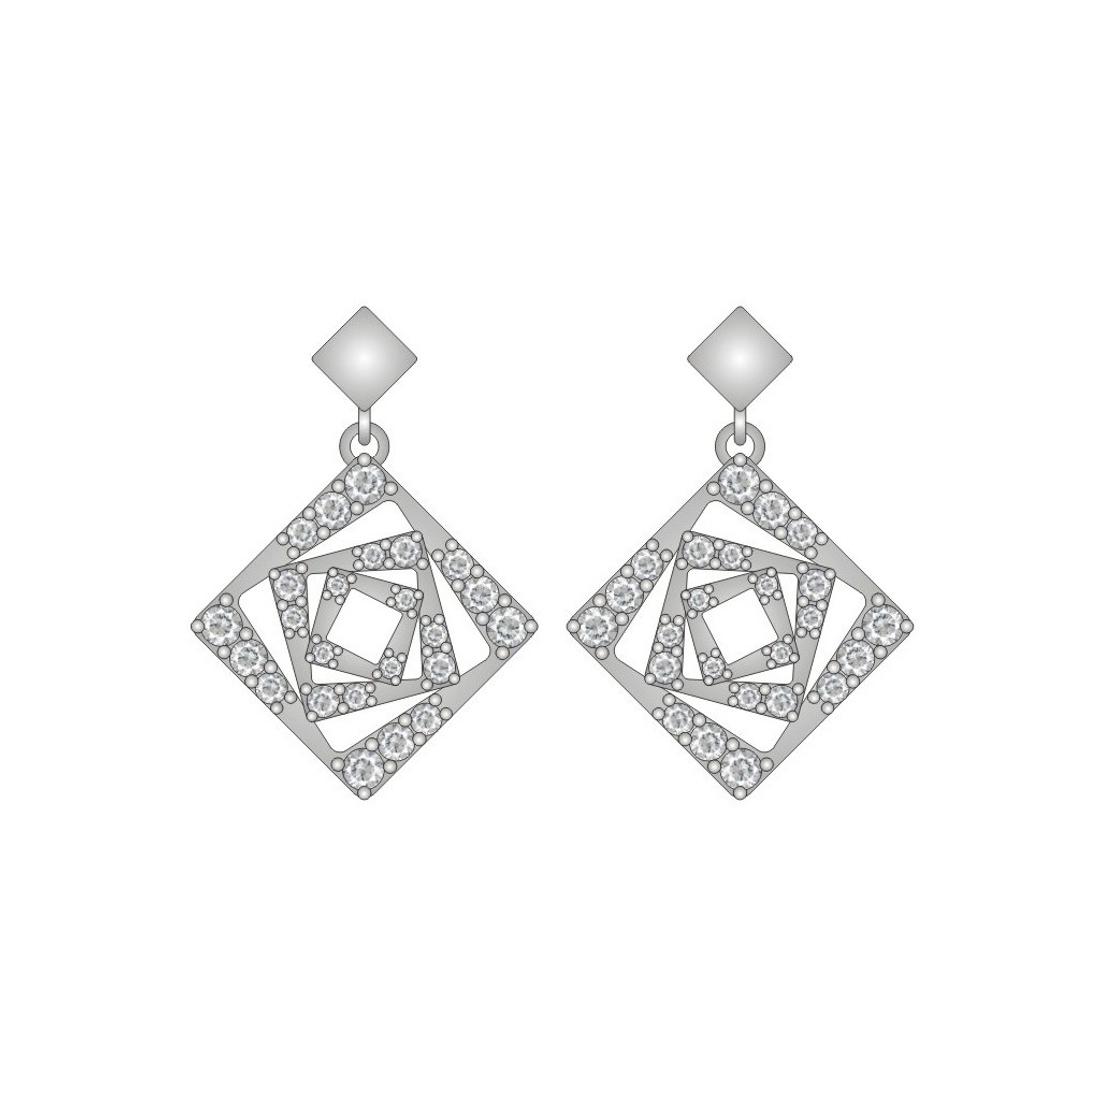 Sarvada Jewels' The Kelly Earrrings